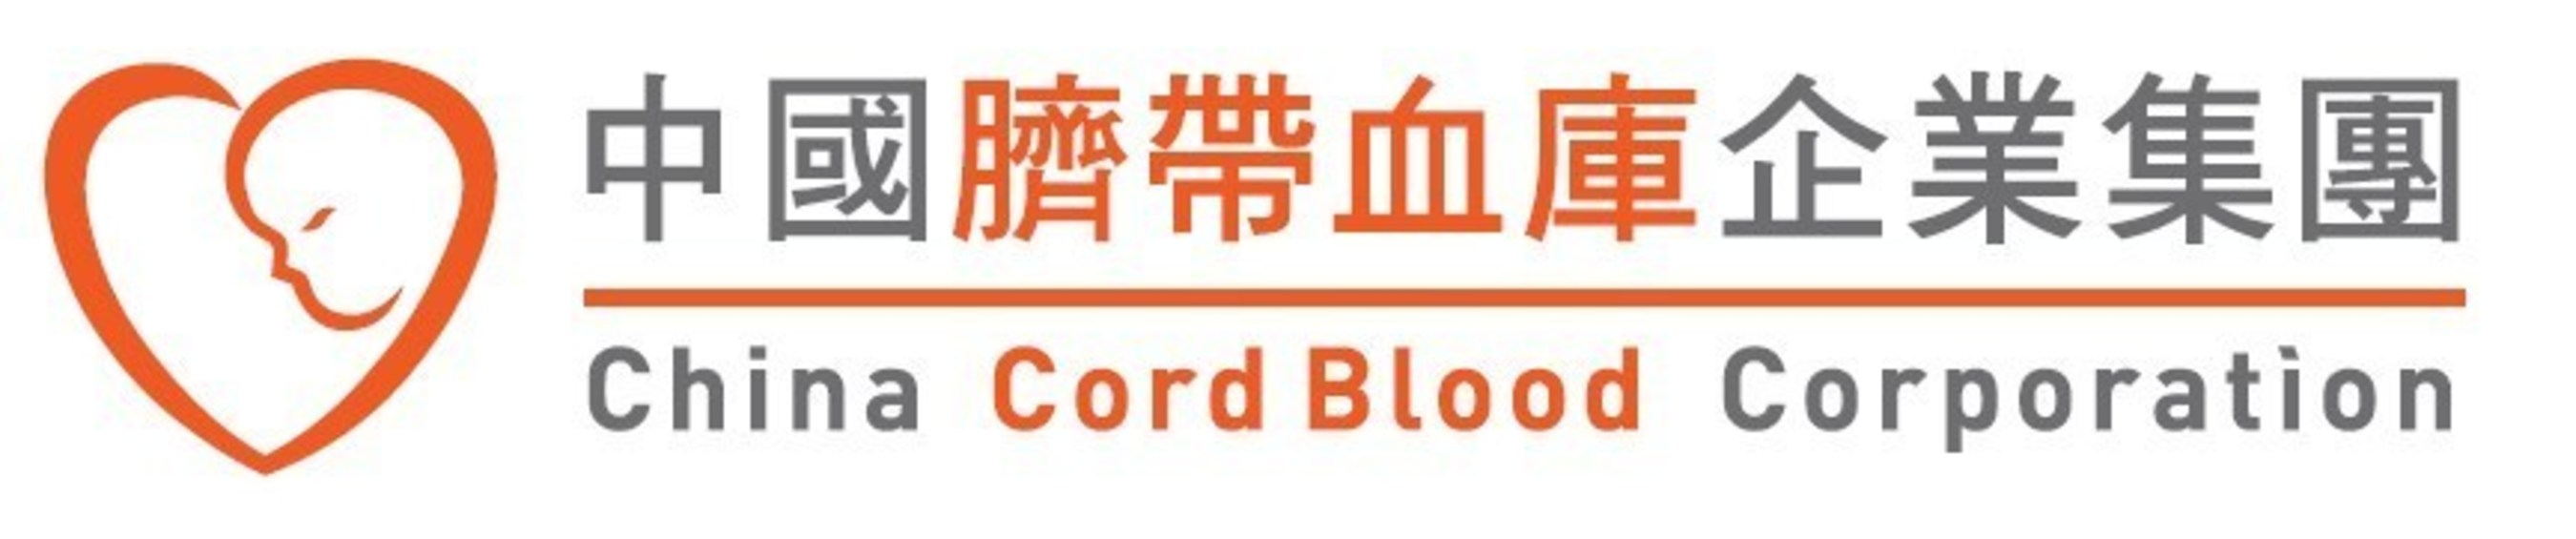 China Cord Blood Corporation (www.chinacordbloodcorp.com)